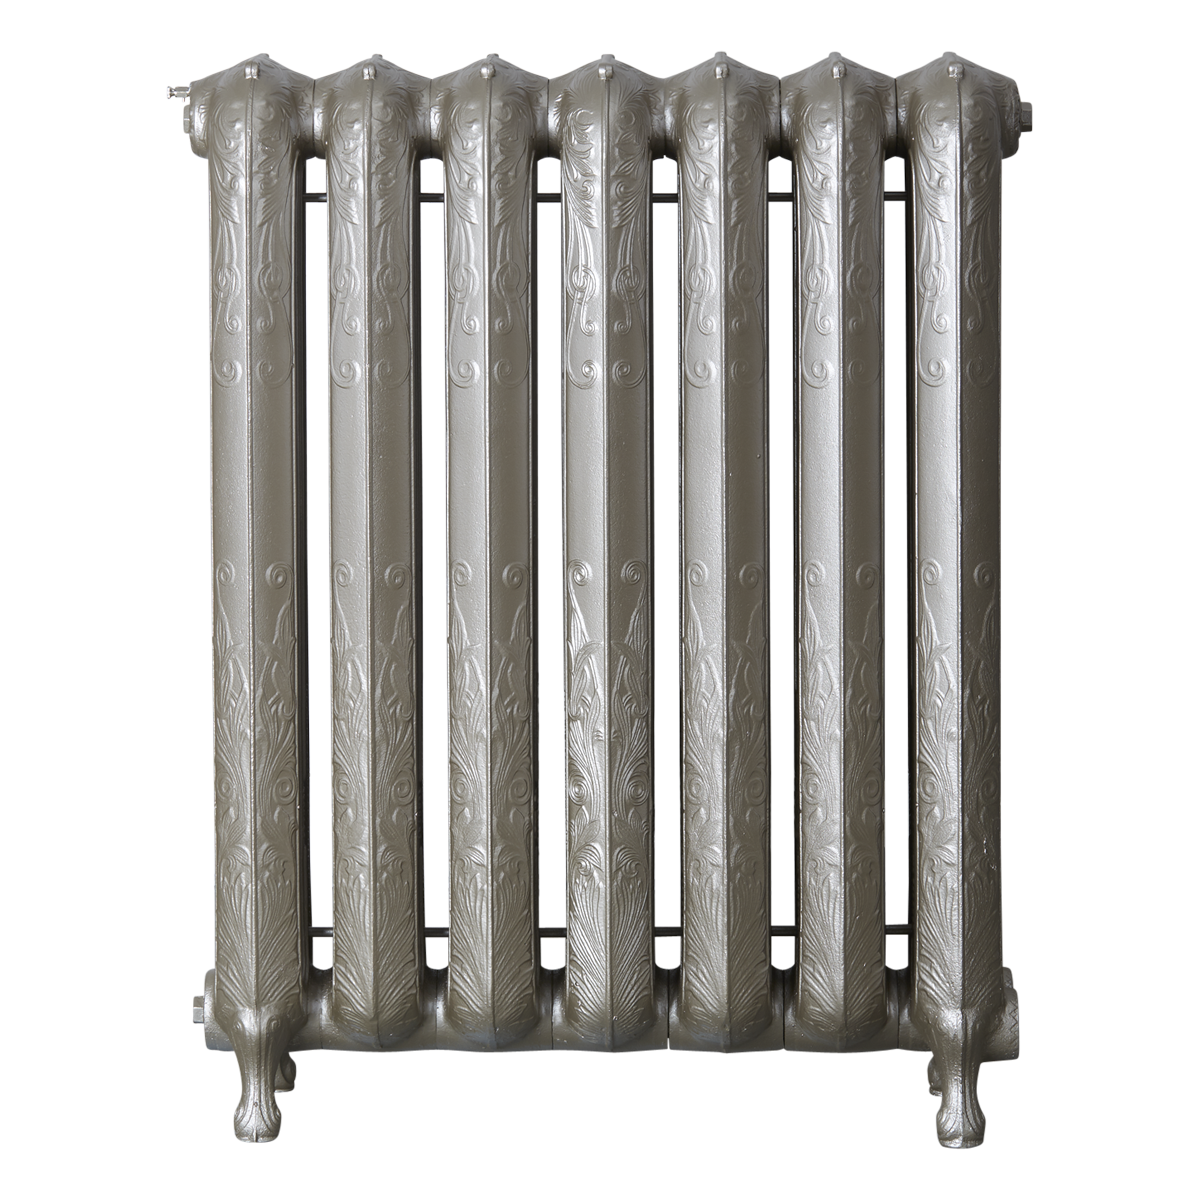 Ironworks Radiators Inc. refurbished cast iron radiator Wellington in Nickel Metallic